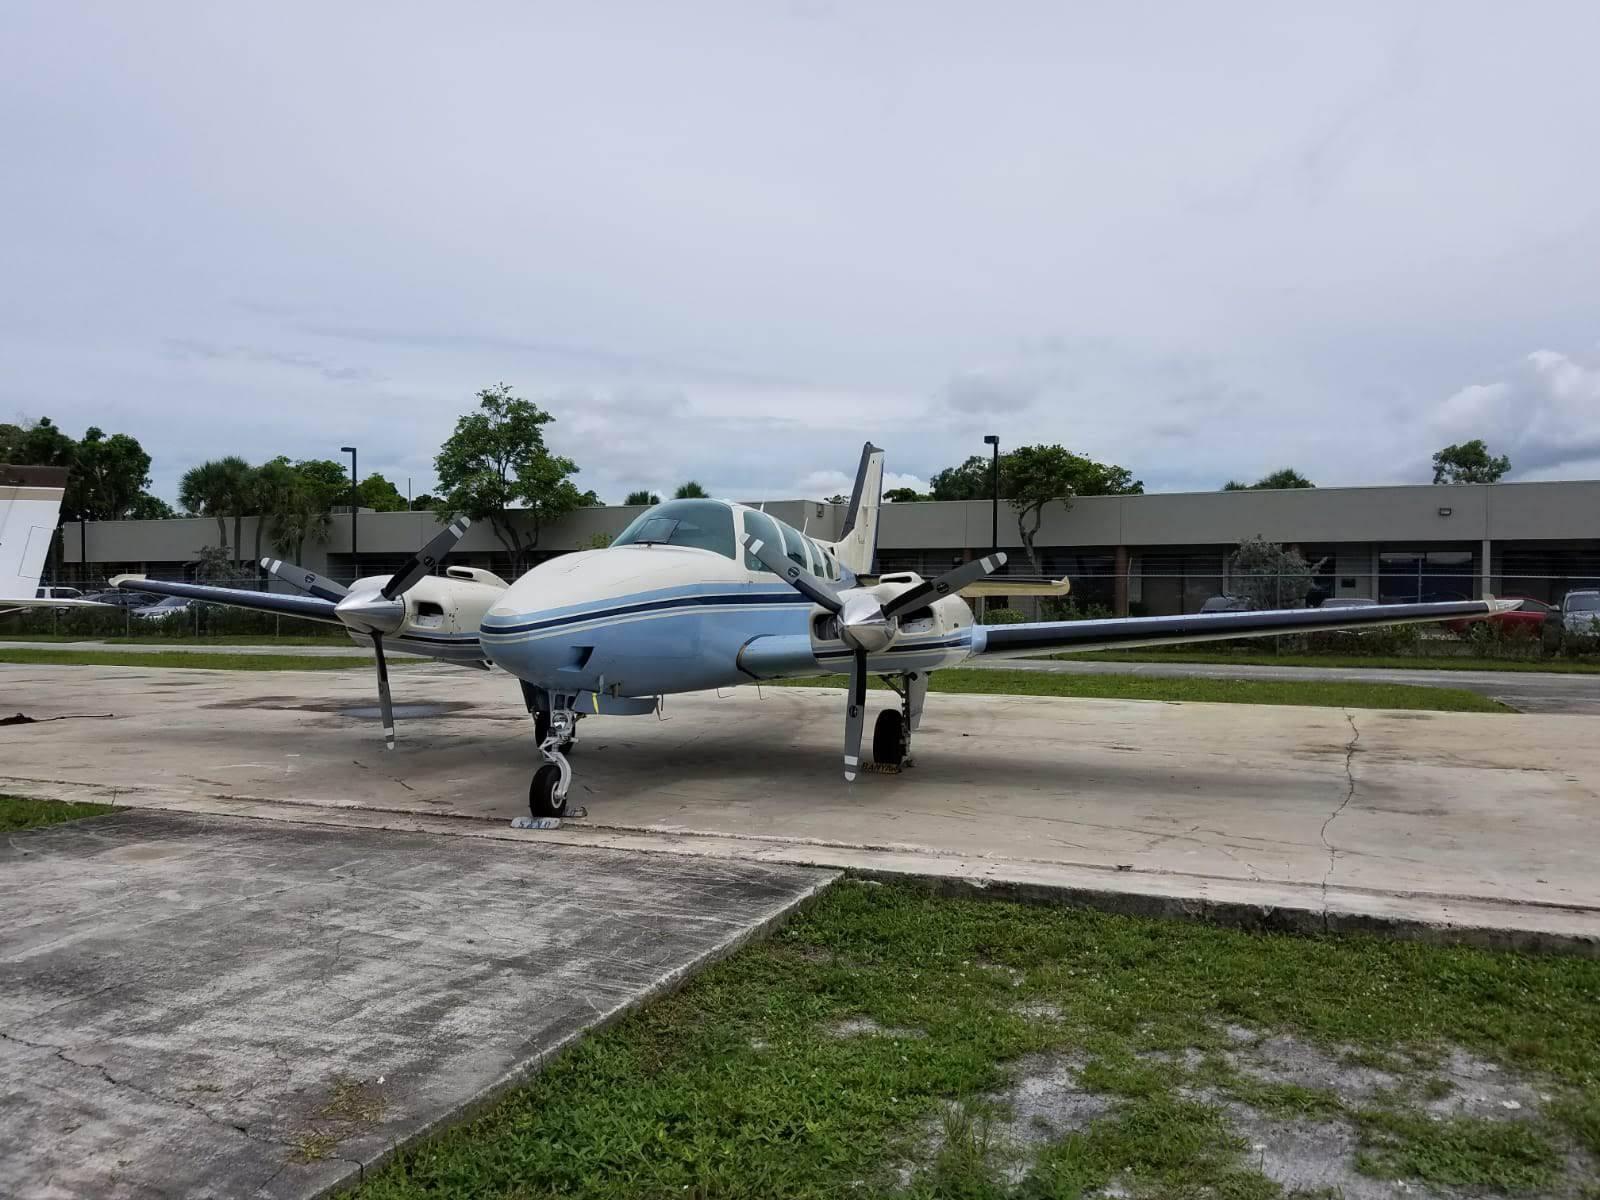 minor damage 1984 Beechcraft Baron B 58 aircraft for sale